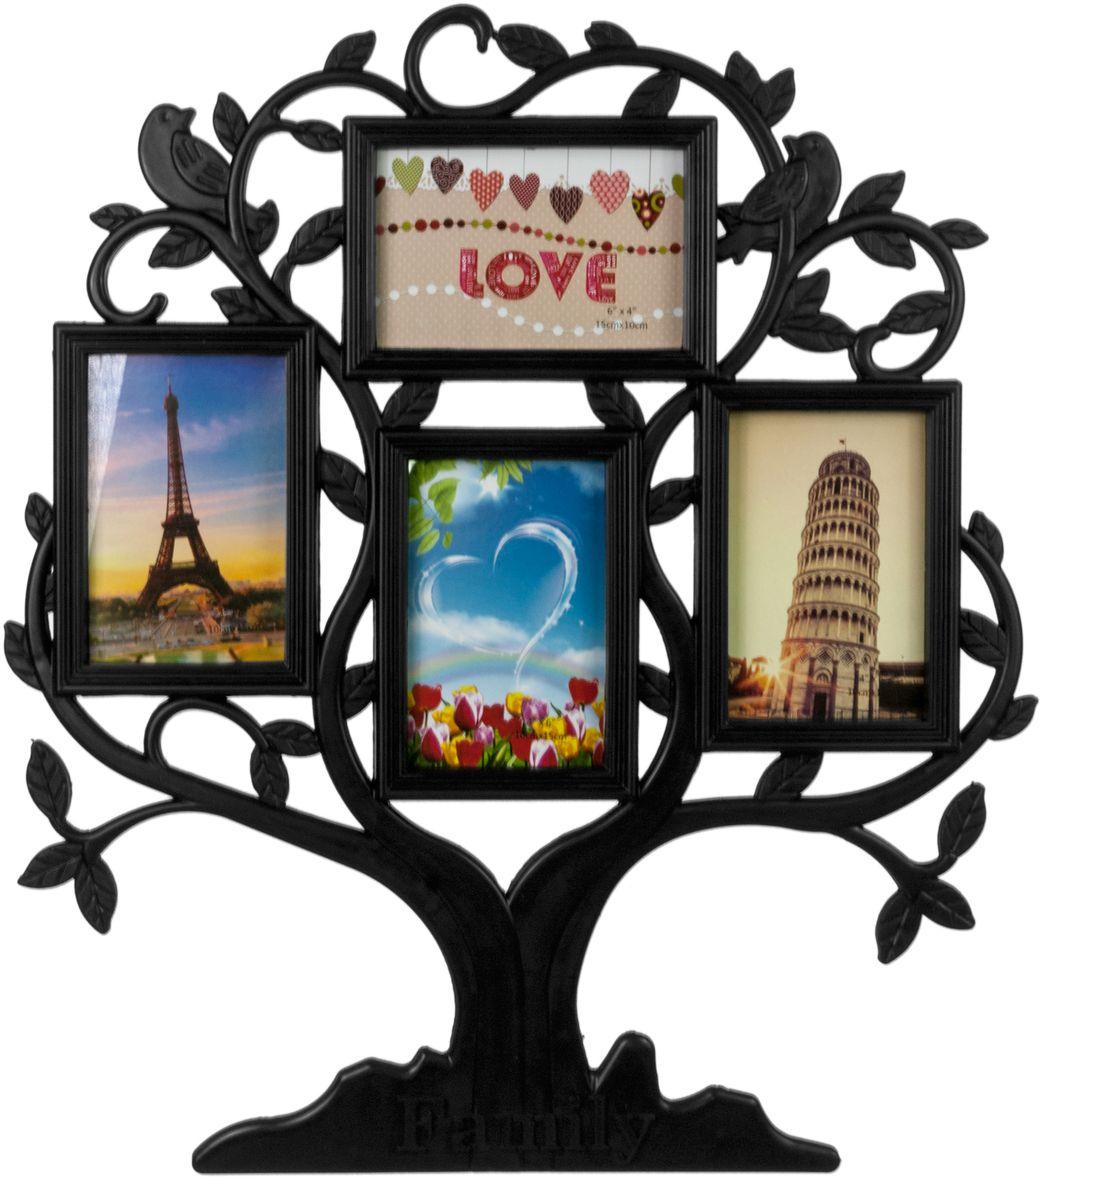 Фоторамка-коллаж Platinum Родословное дерево. Family, цвет: черный, 4 фоторамки. BIN-1124348-BBIN-1124348-BПластиковый коллаж с 4 фото 10 х 15 см.